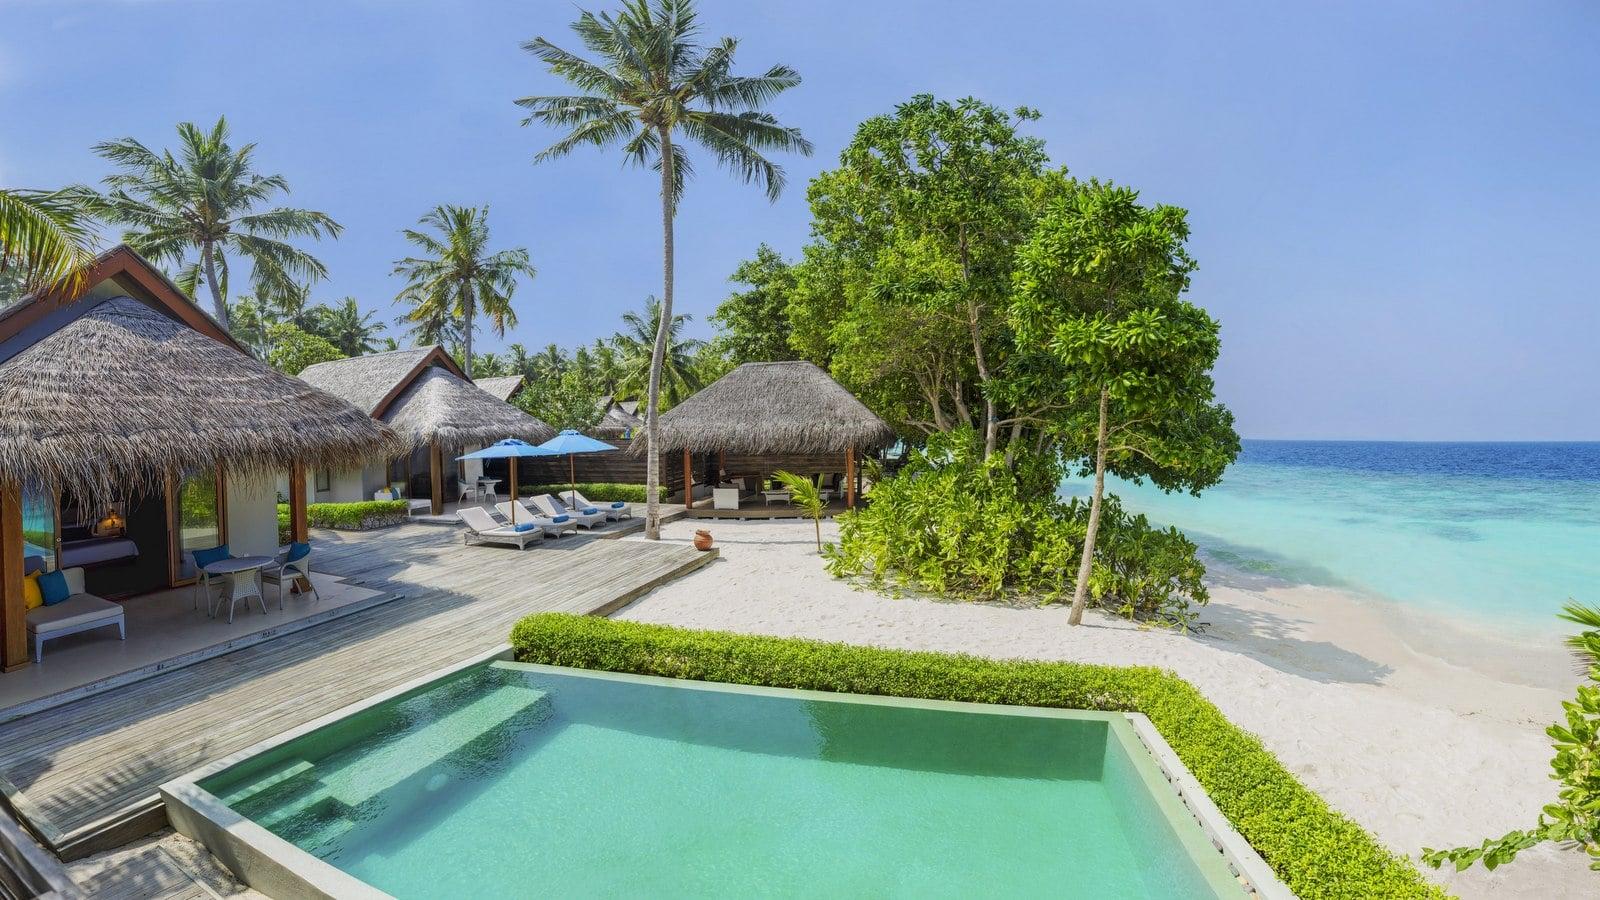 Мальдивы, отель Dusit Thani Maldives, номер Two Bedroom Family Beach Villa with Pool